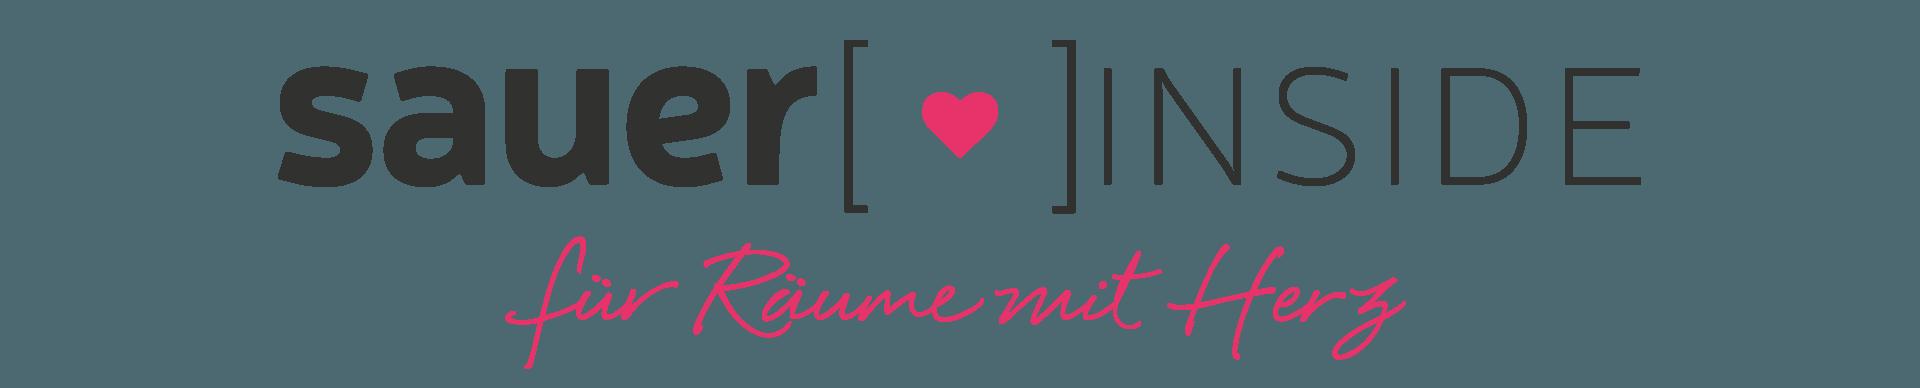 sauer-inside-logo